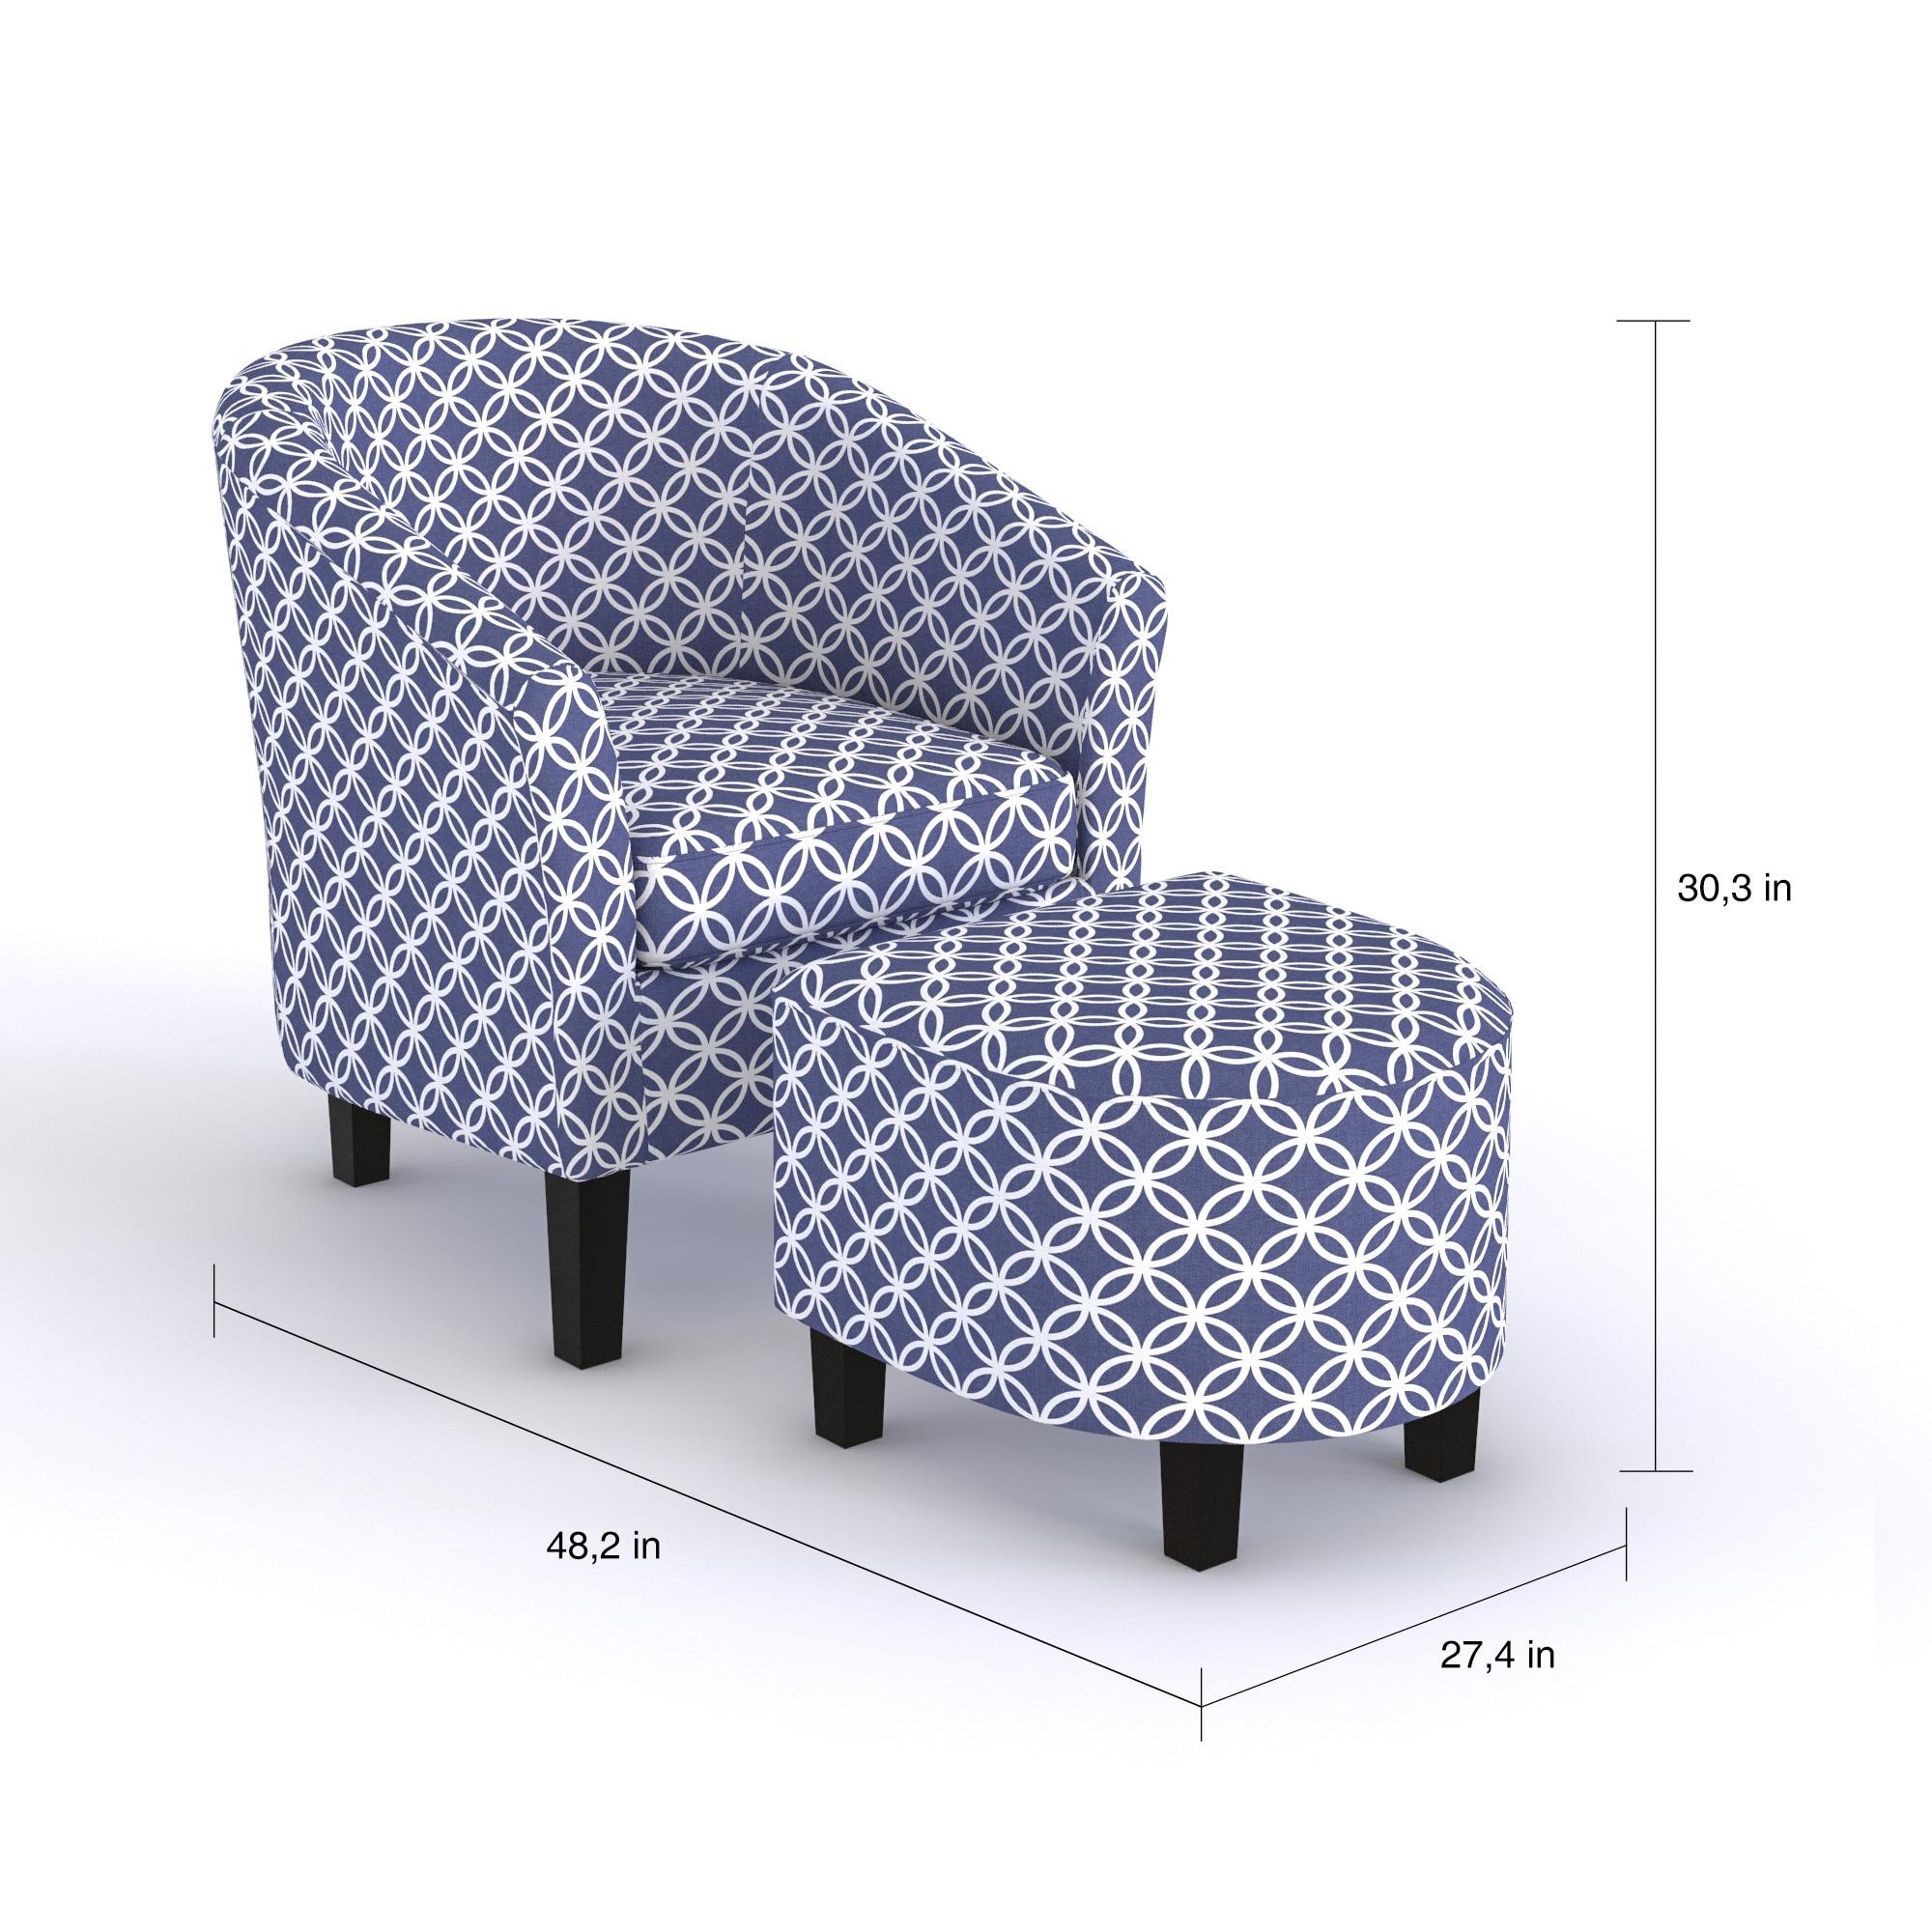 Shop Porch Den Brust Dark Blue Club Chair And Ottoman On Sale